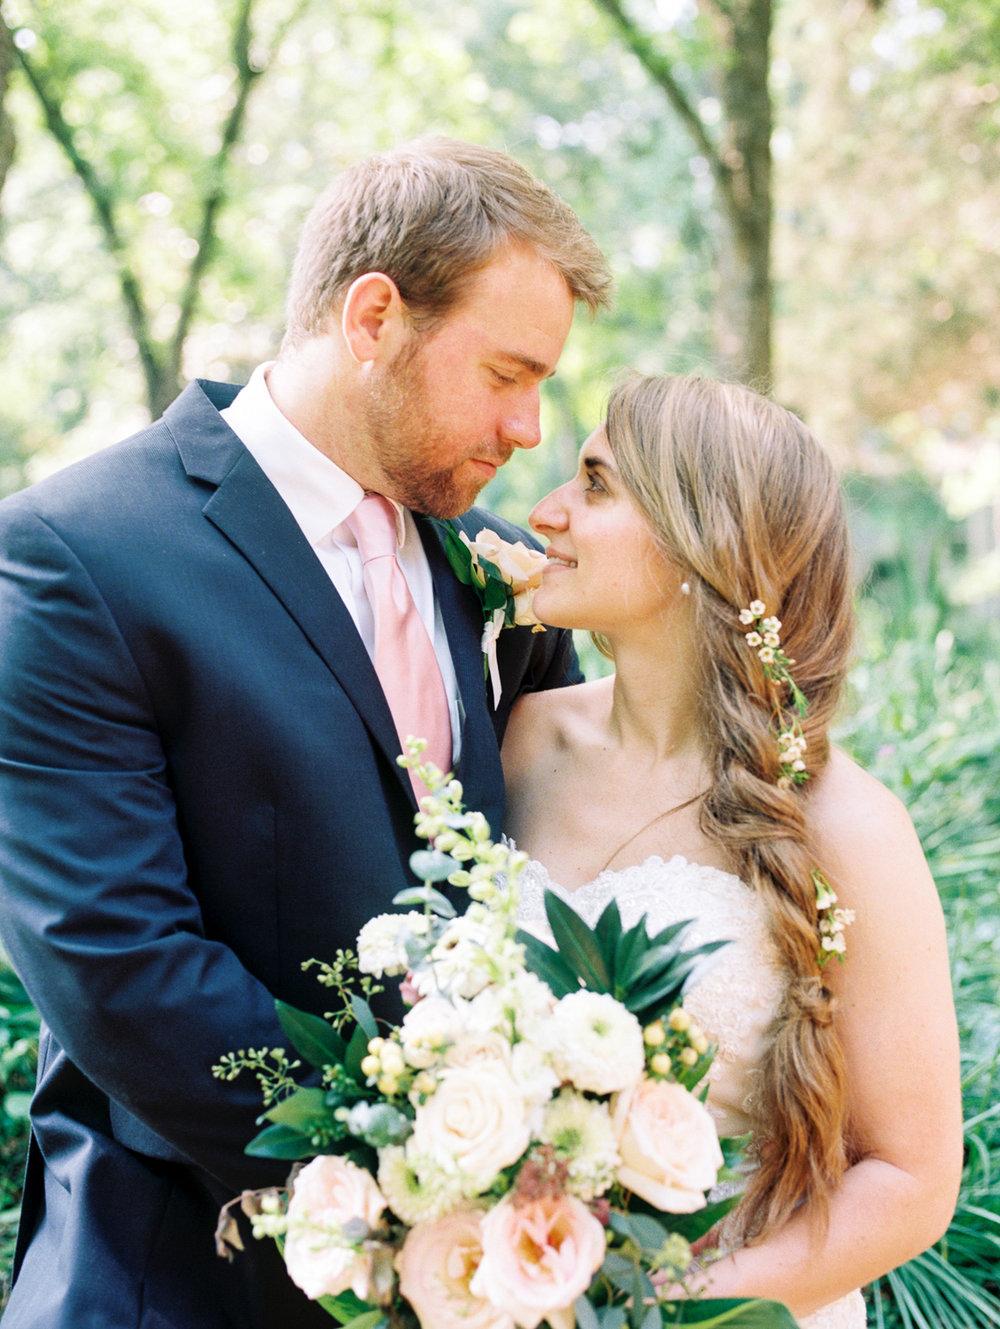 christinadavisphotography-romanticwedding-gardenweddinginspiration14.jpg